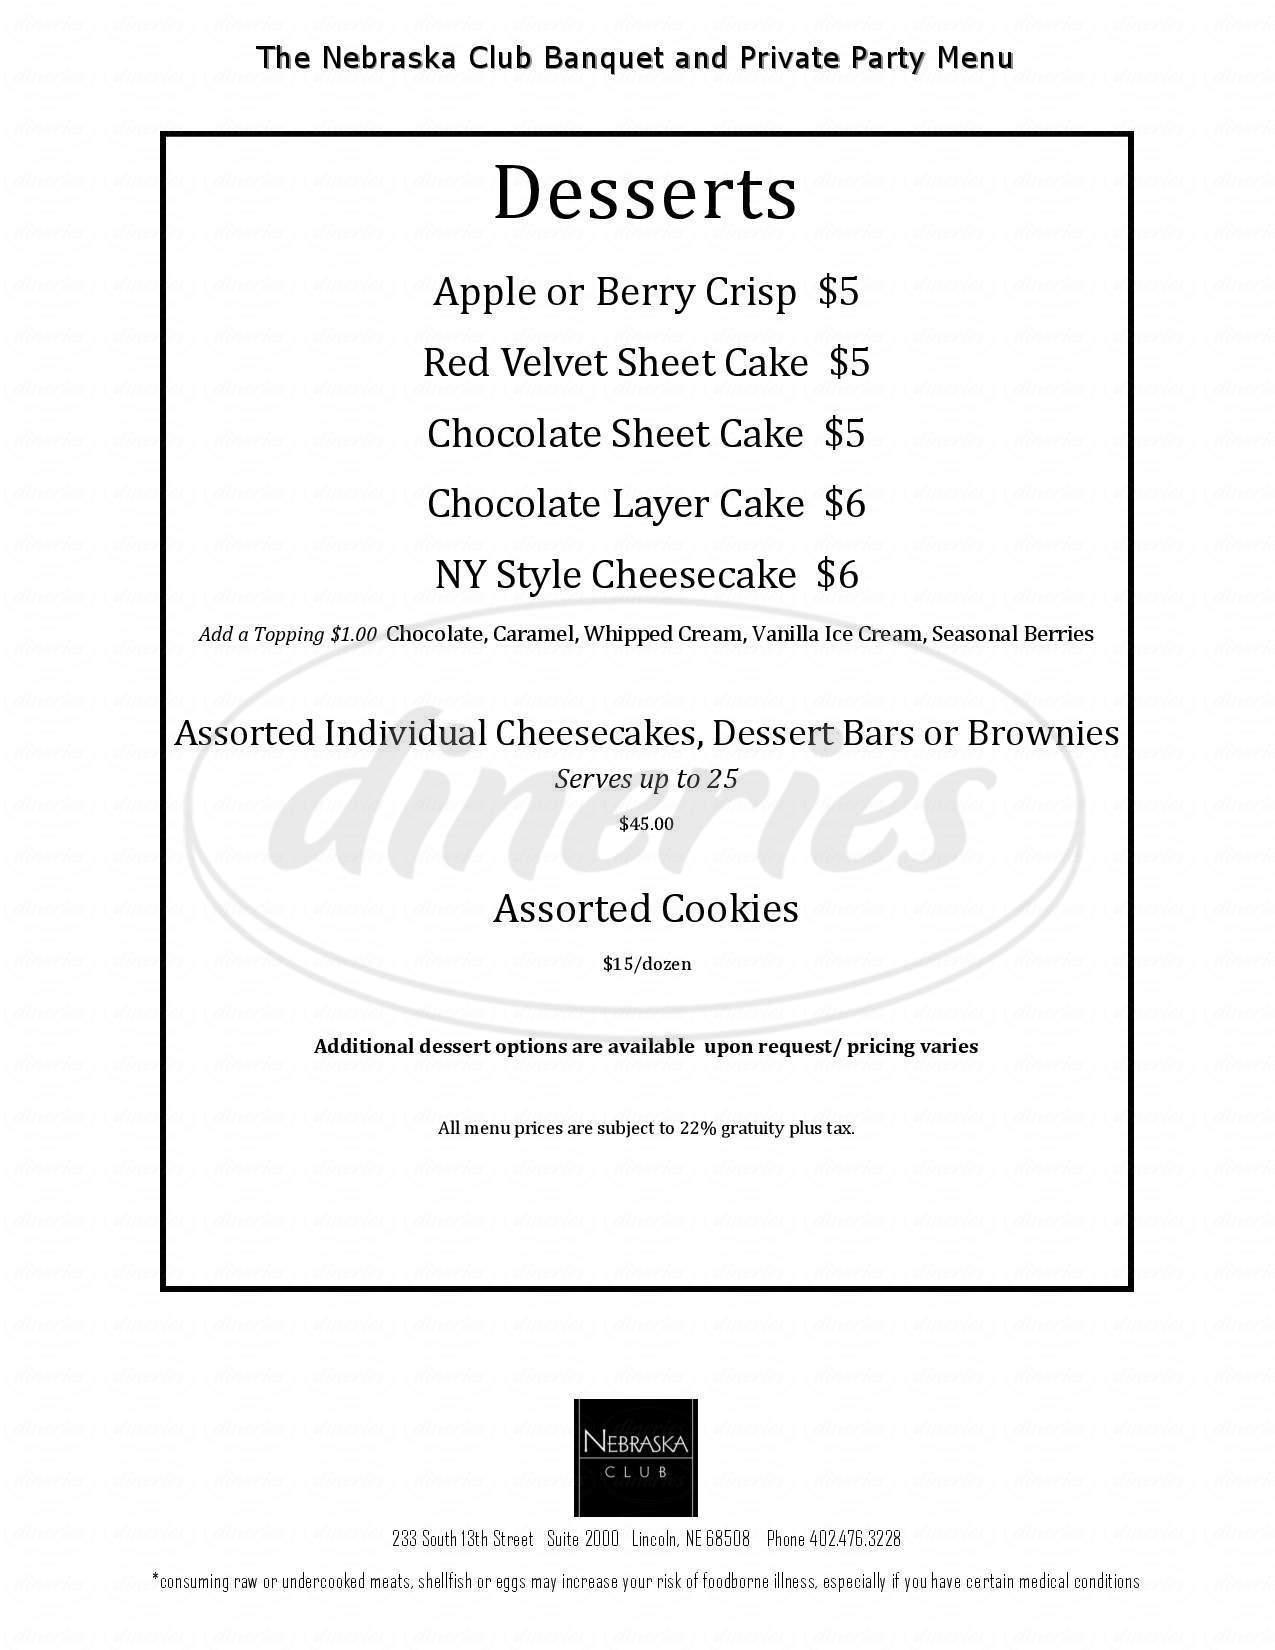 menu for The Nebraska Club